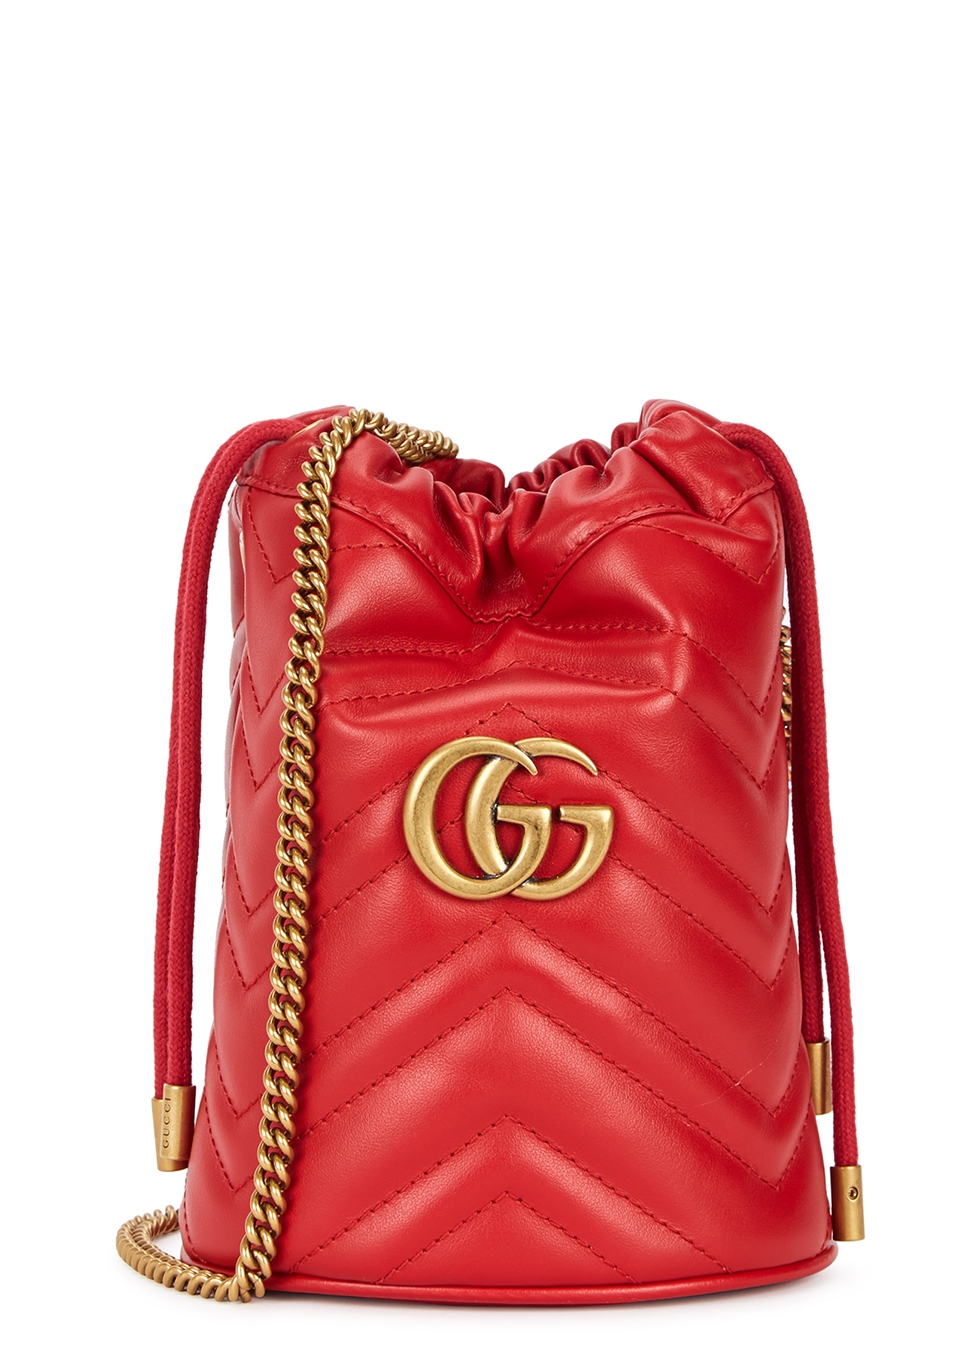 3b52a02649c Women's Designer Bags, Handbags and Purses - Harvey Nichols